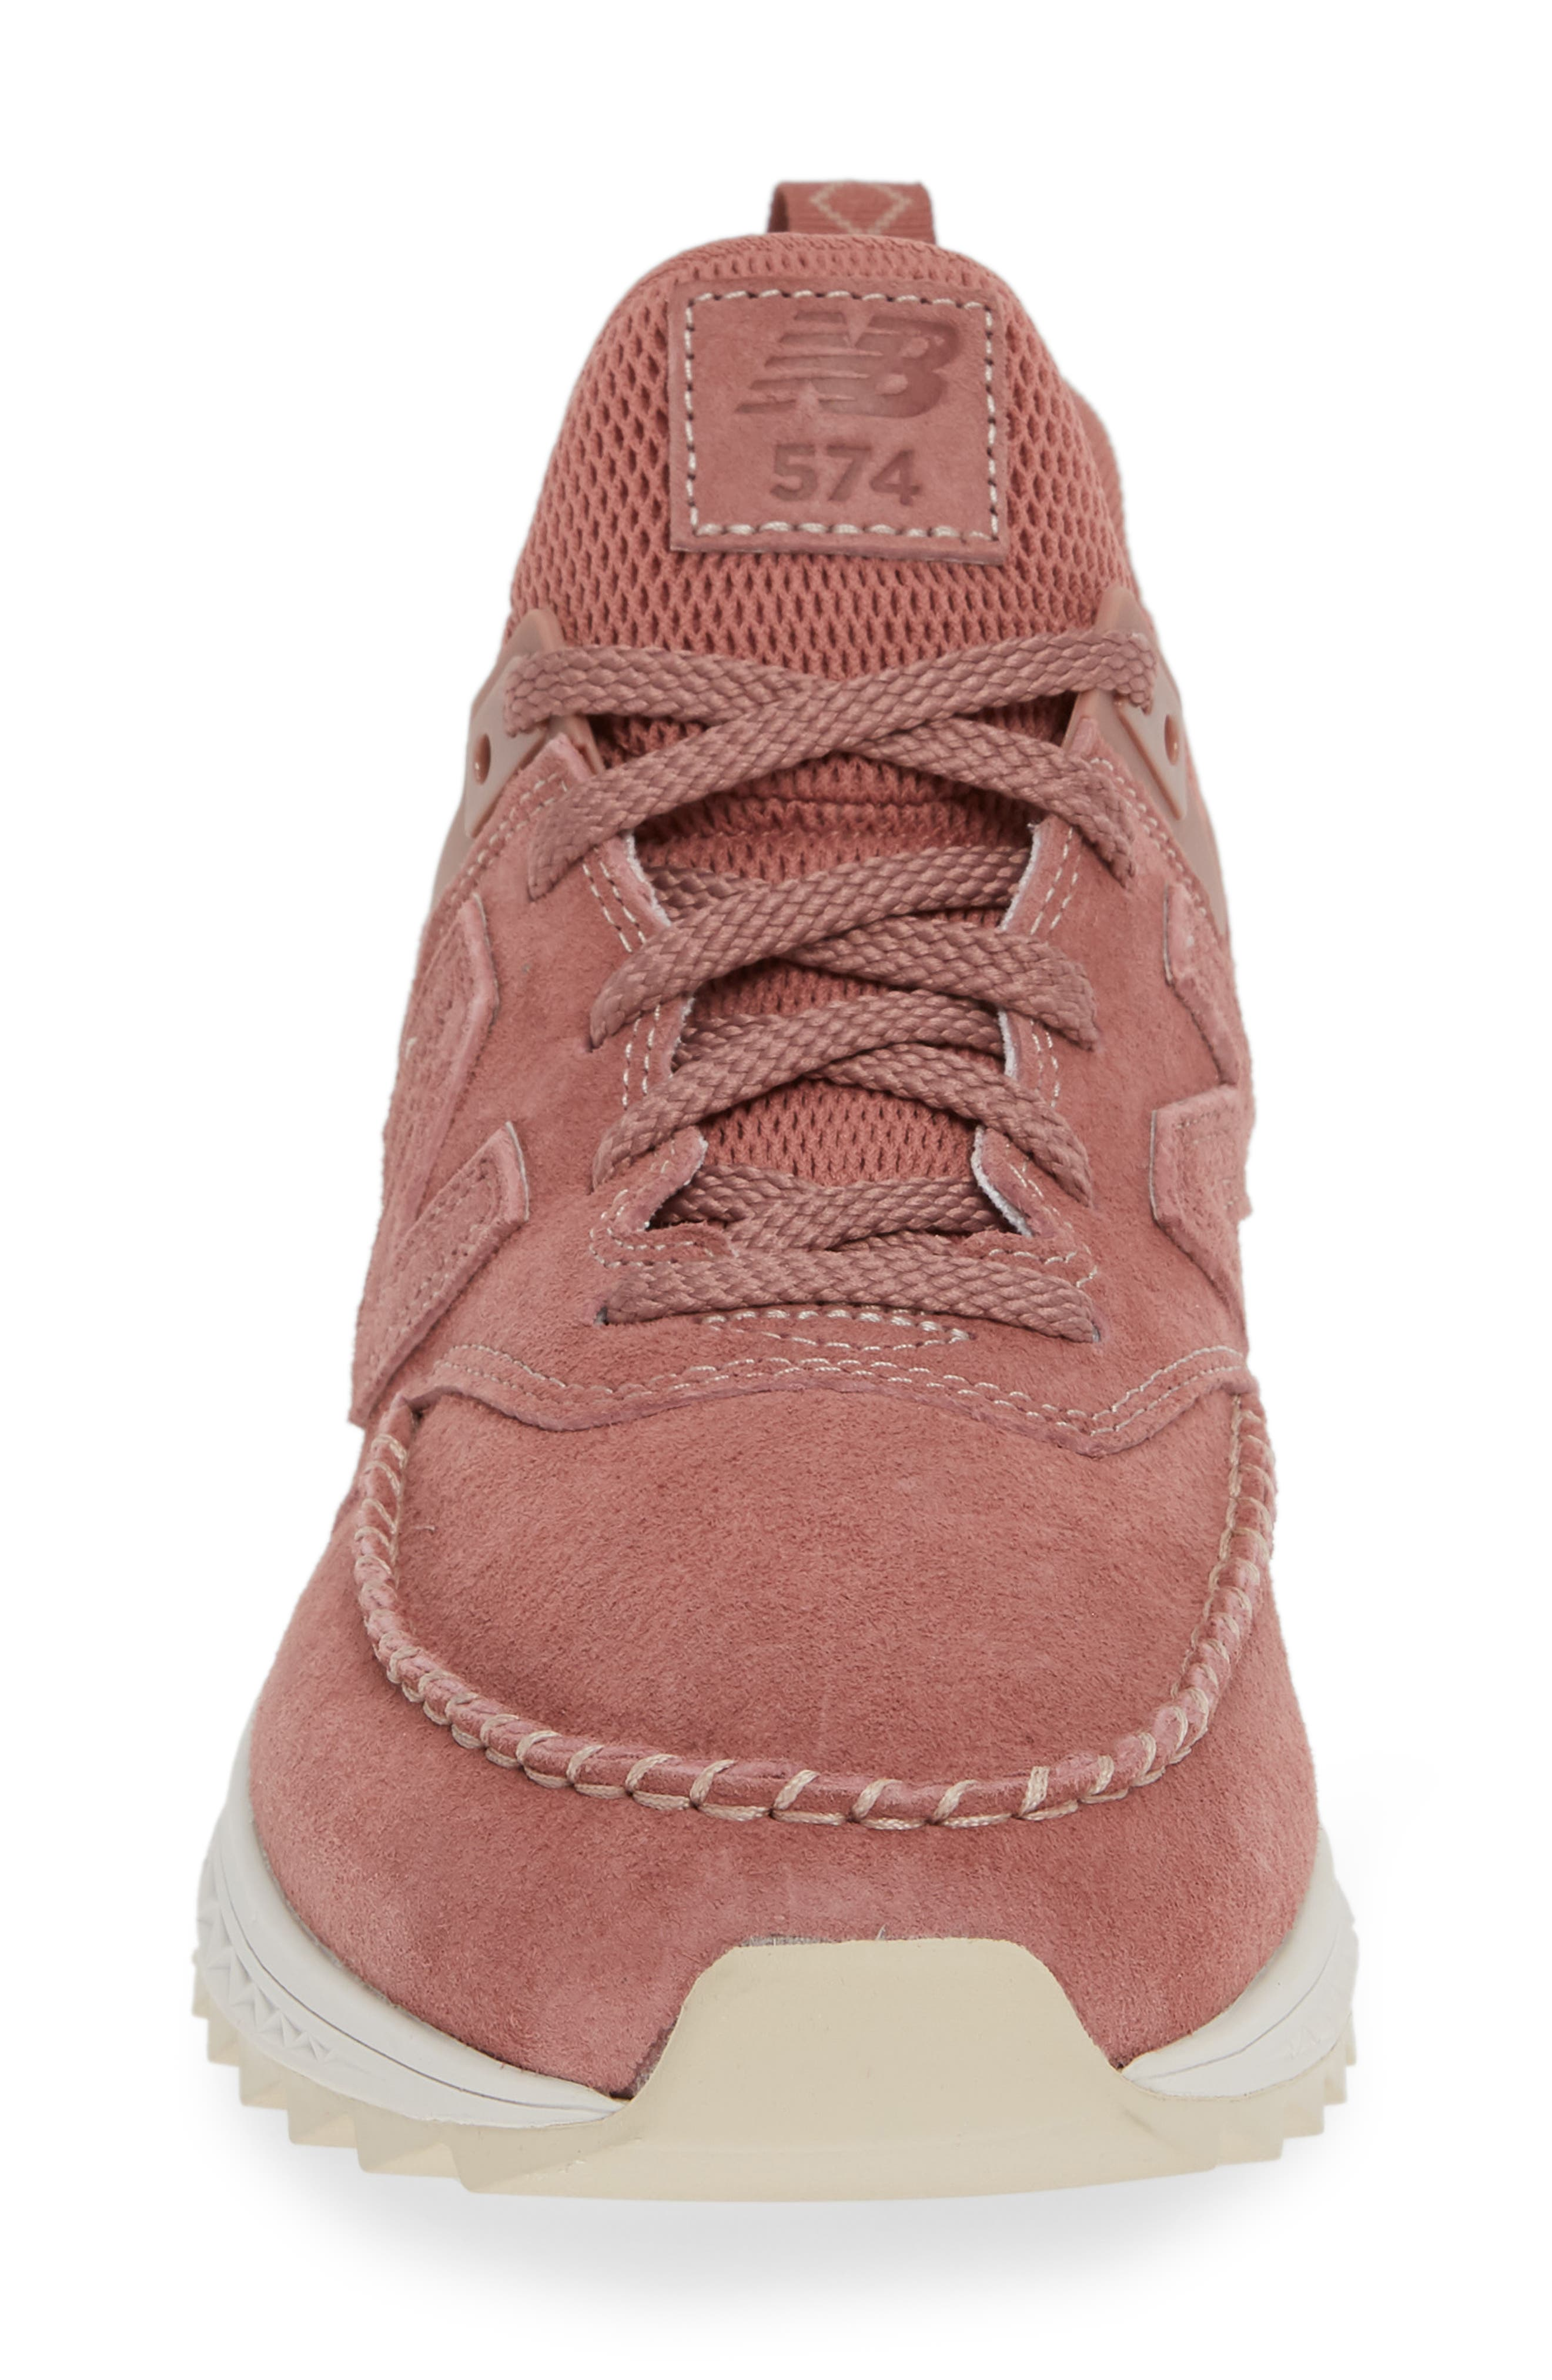 574 Sport Sneaker,                             Alternate thumbnail 4, color,                             DARK OXIDE SUEDE/ MESH